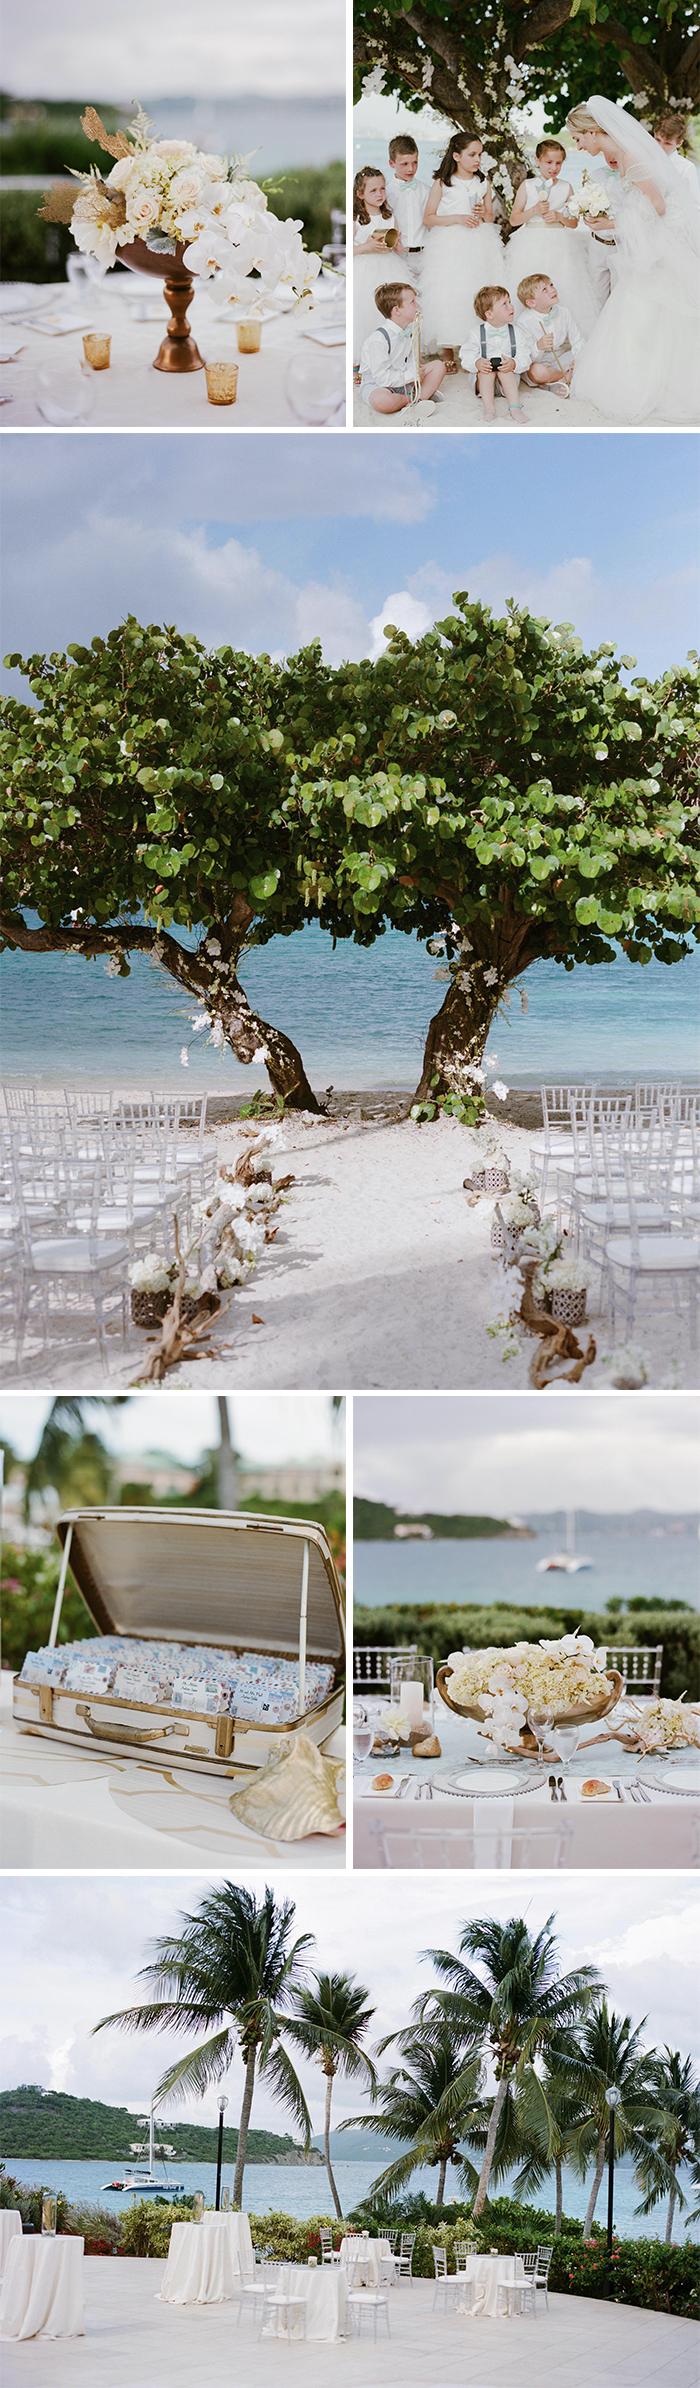 Sylvie Gil Destination Wedding photographer